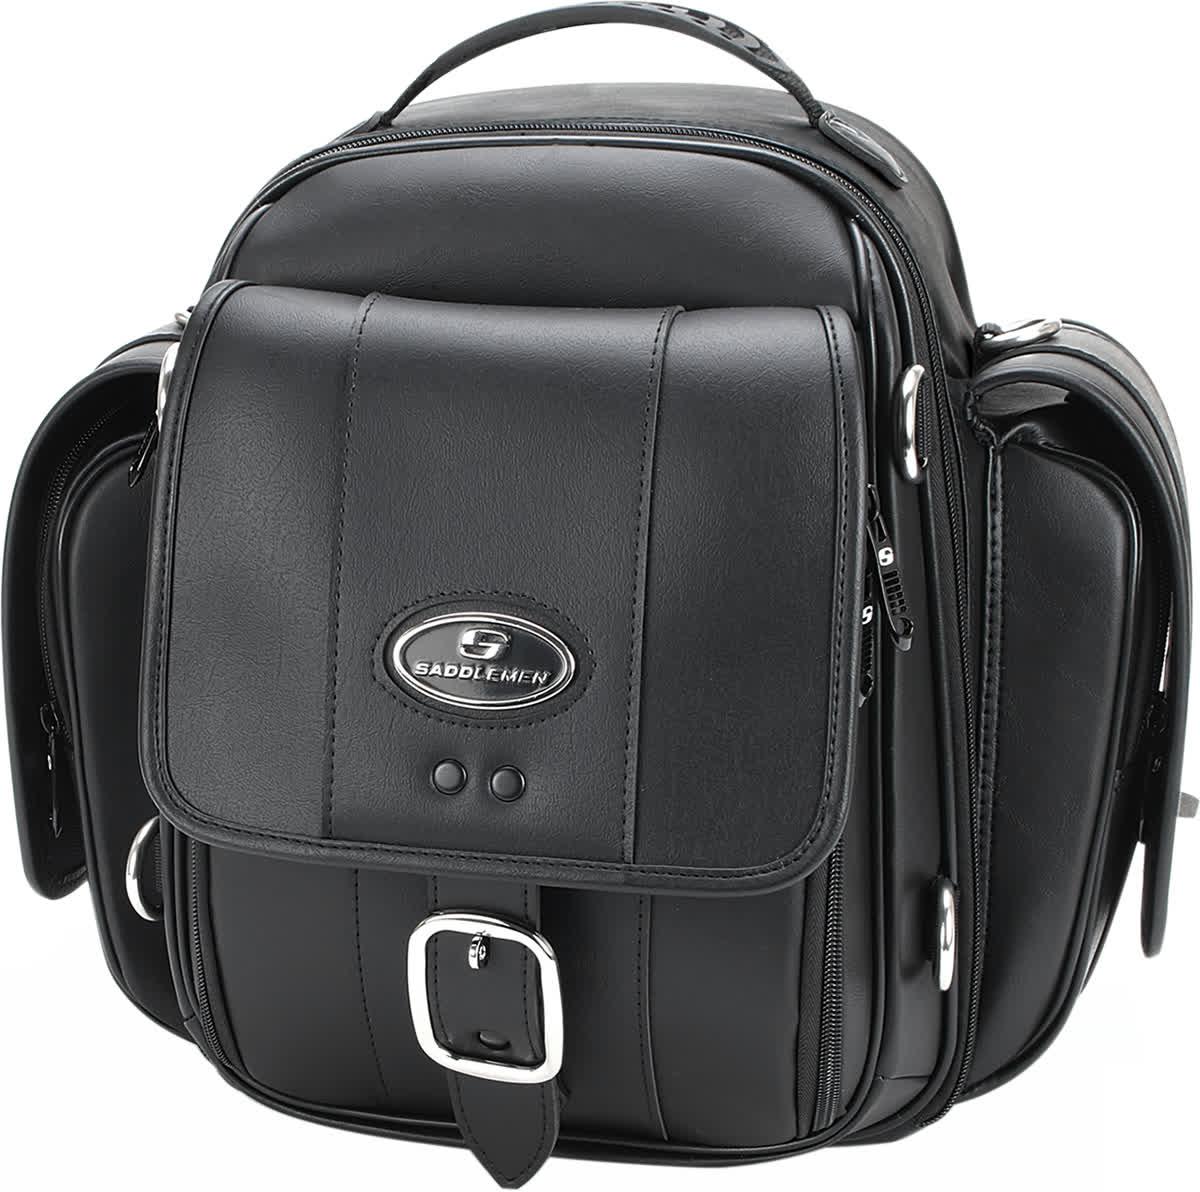 Saddlemen 3515-0172 Sissy Bar Bag Cd1750 3515-0172